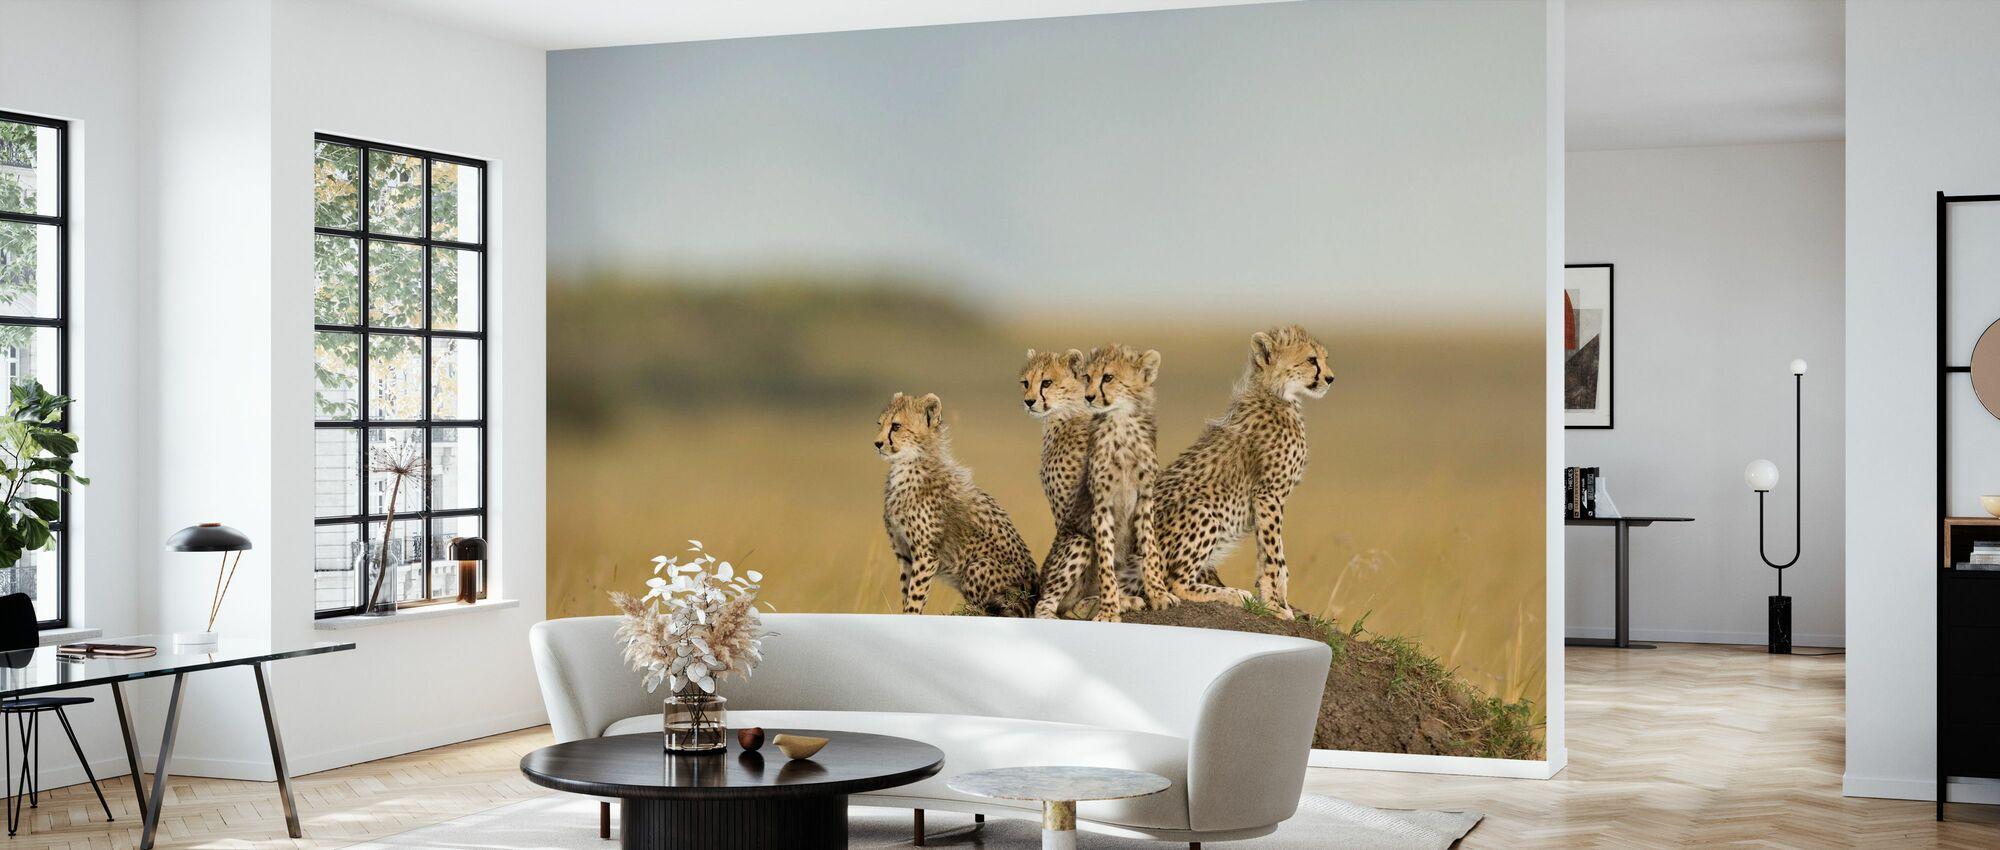 Cheetah Cubs - Wallpaper - Living Room